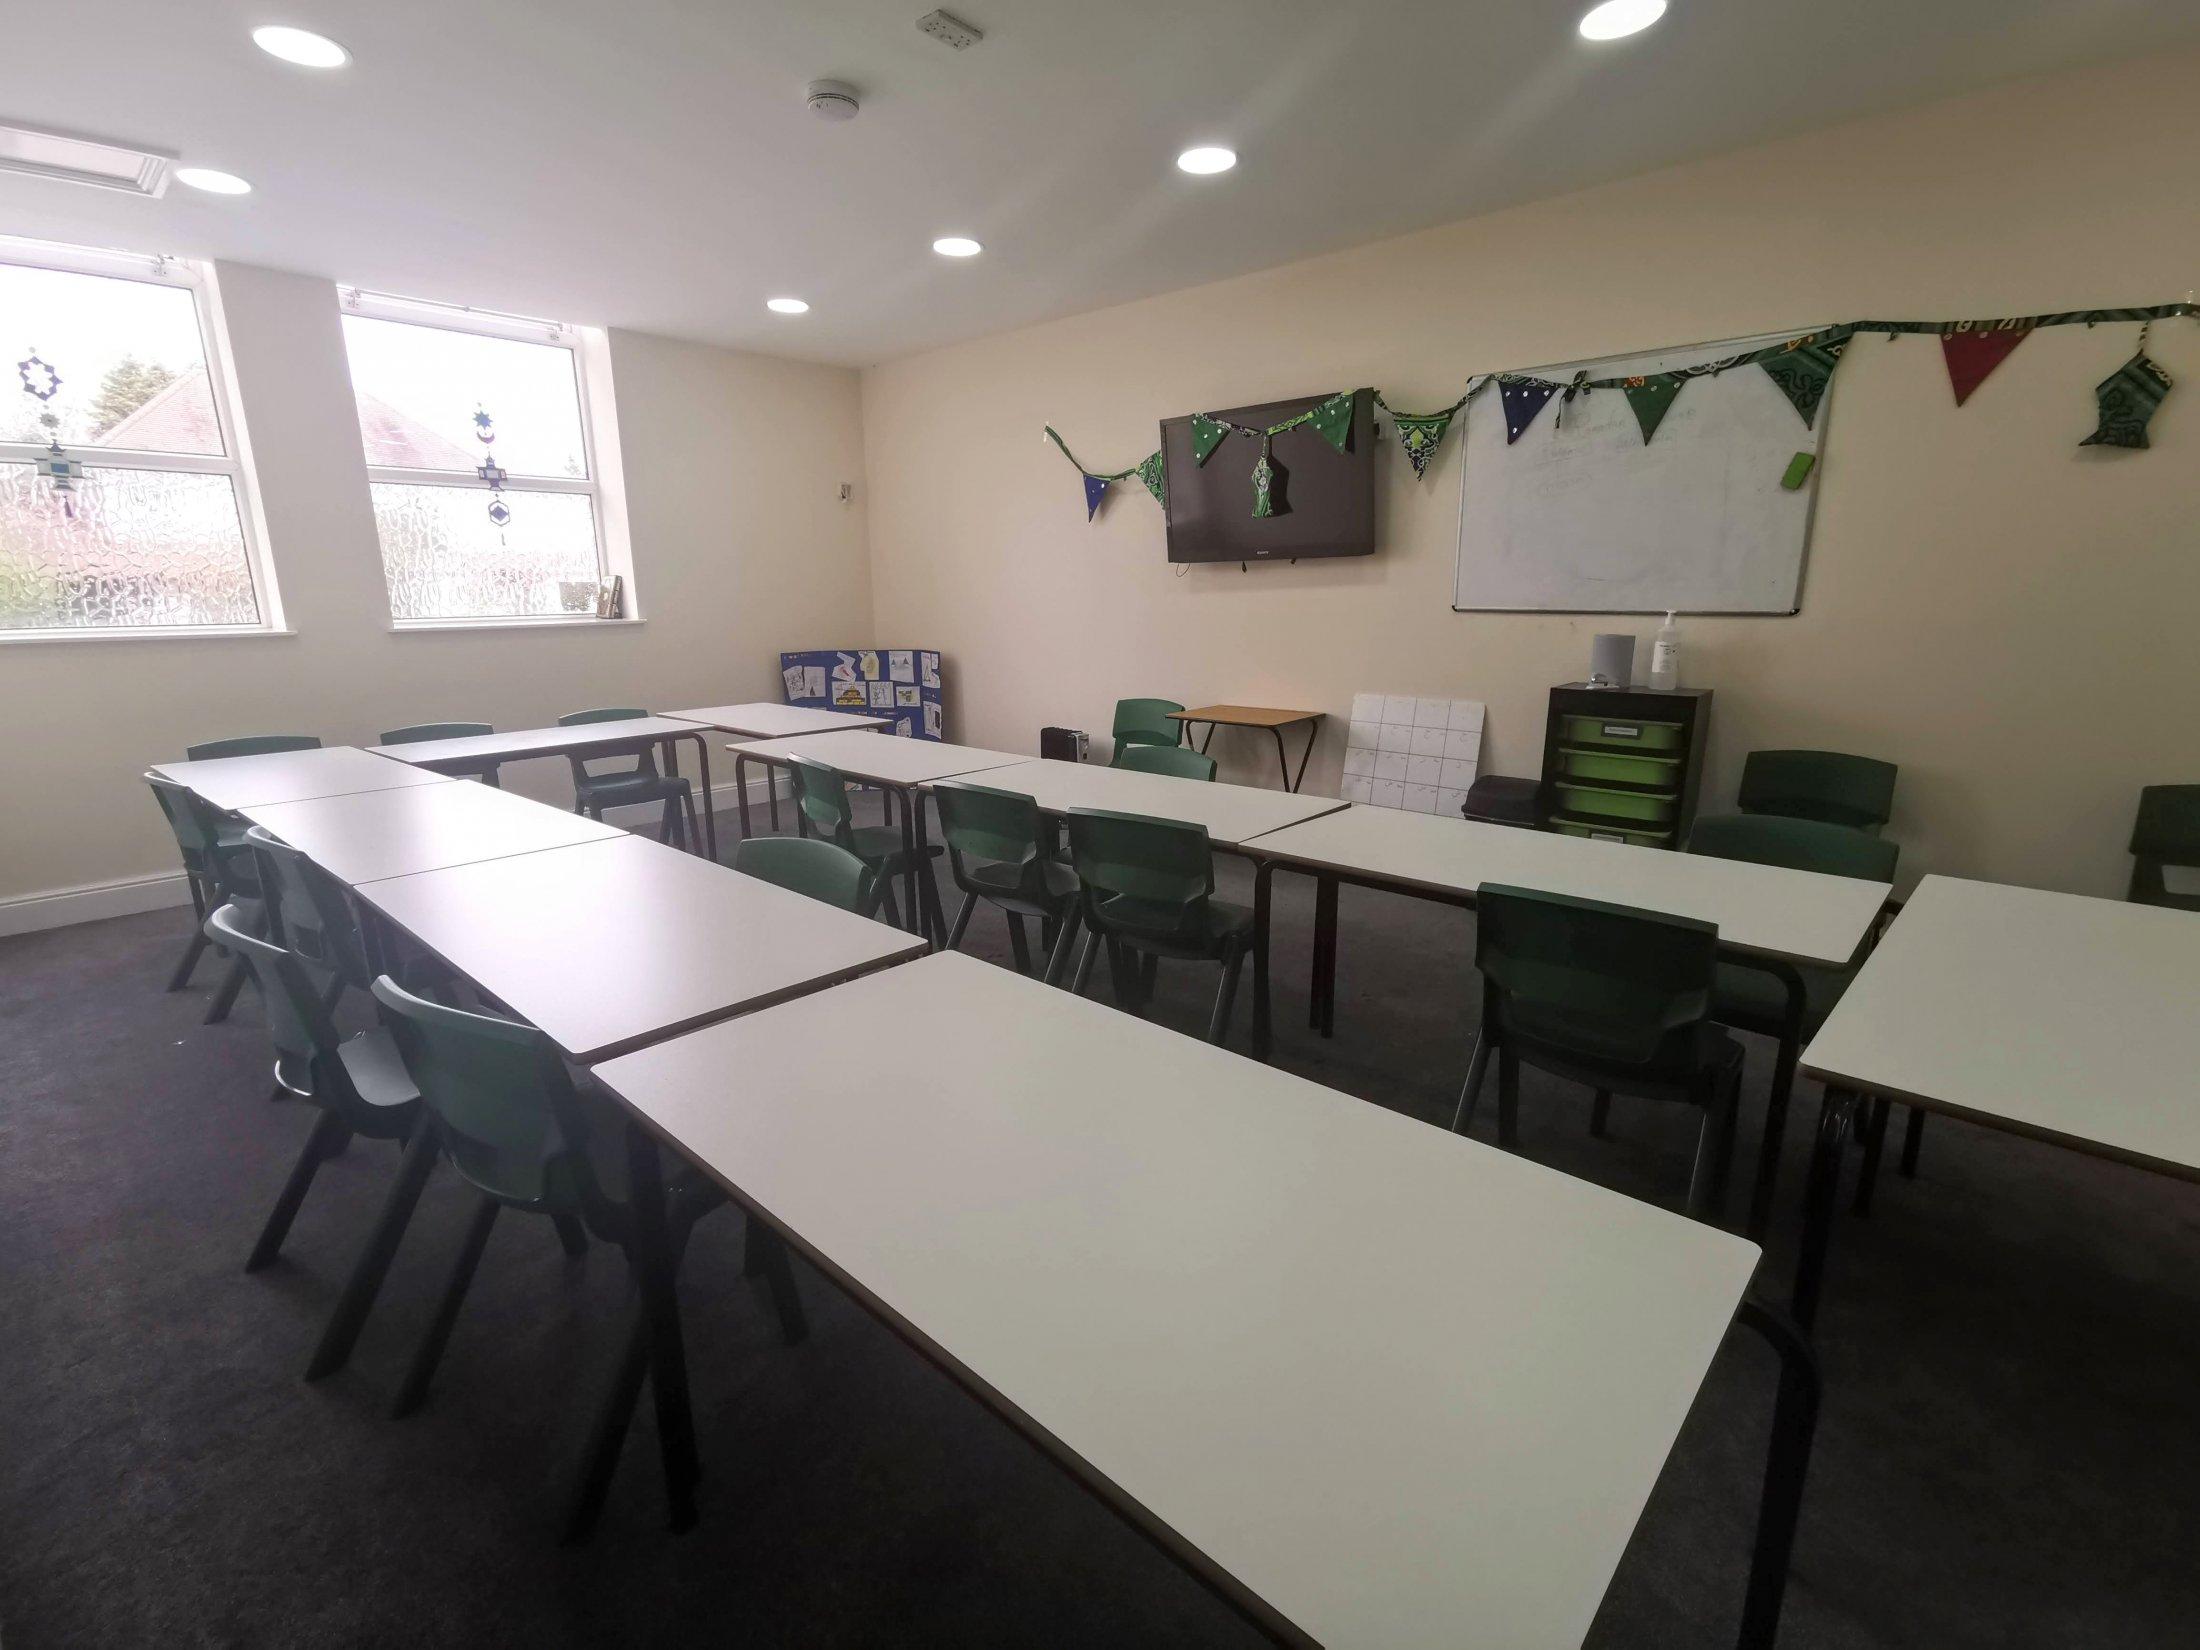 The Abu Hassan classroom